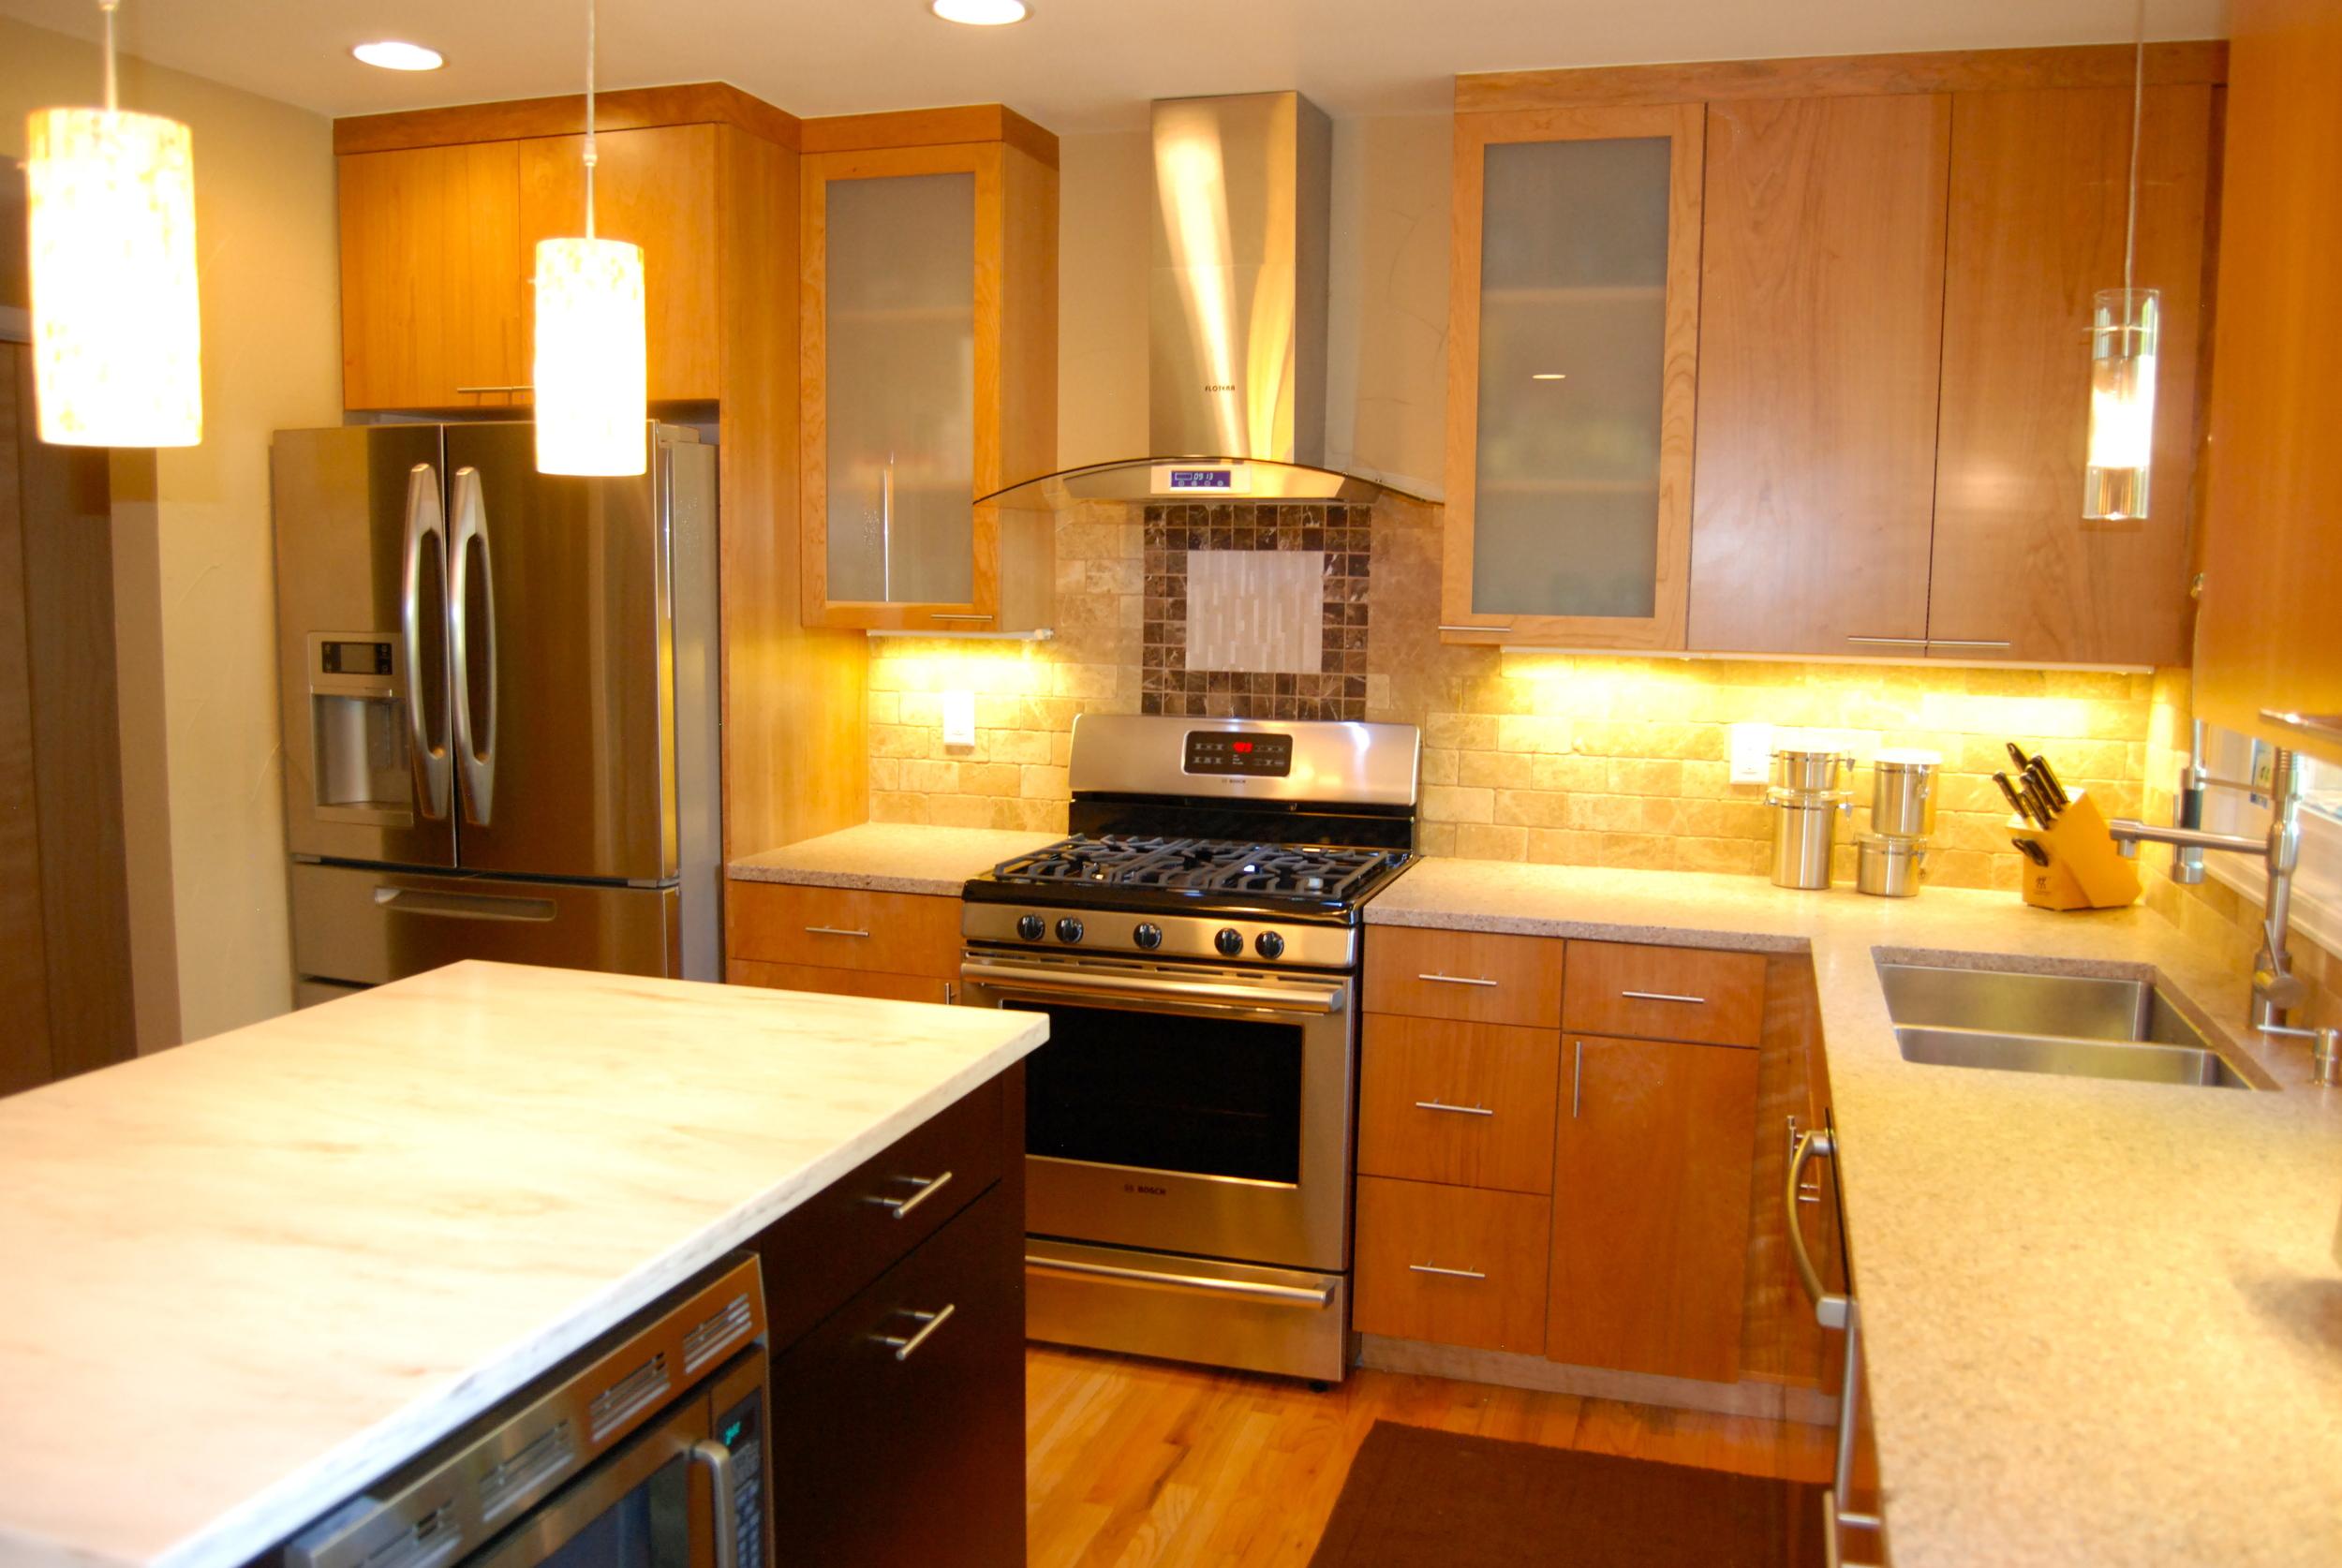 kitchens 03.jpg